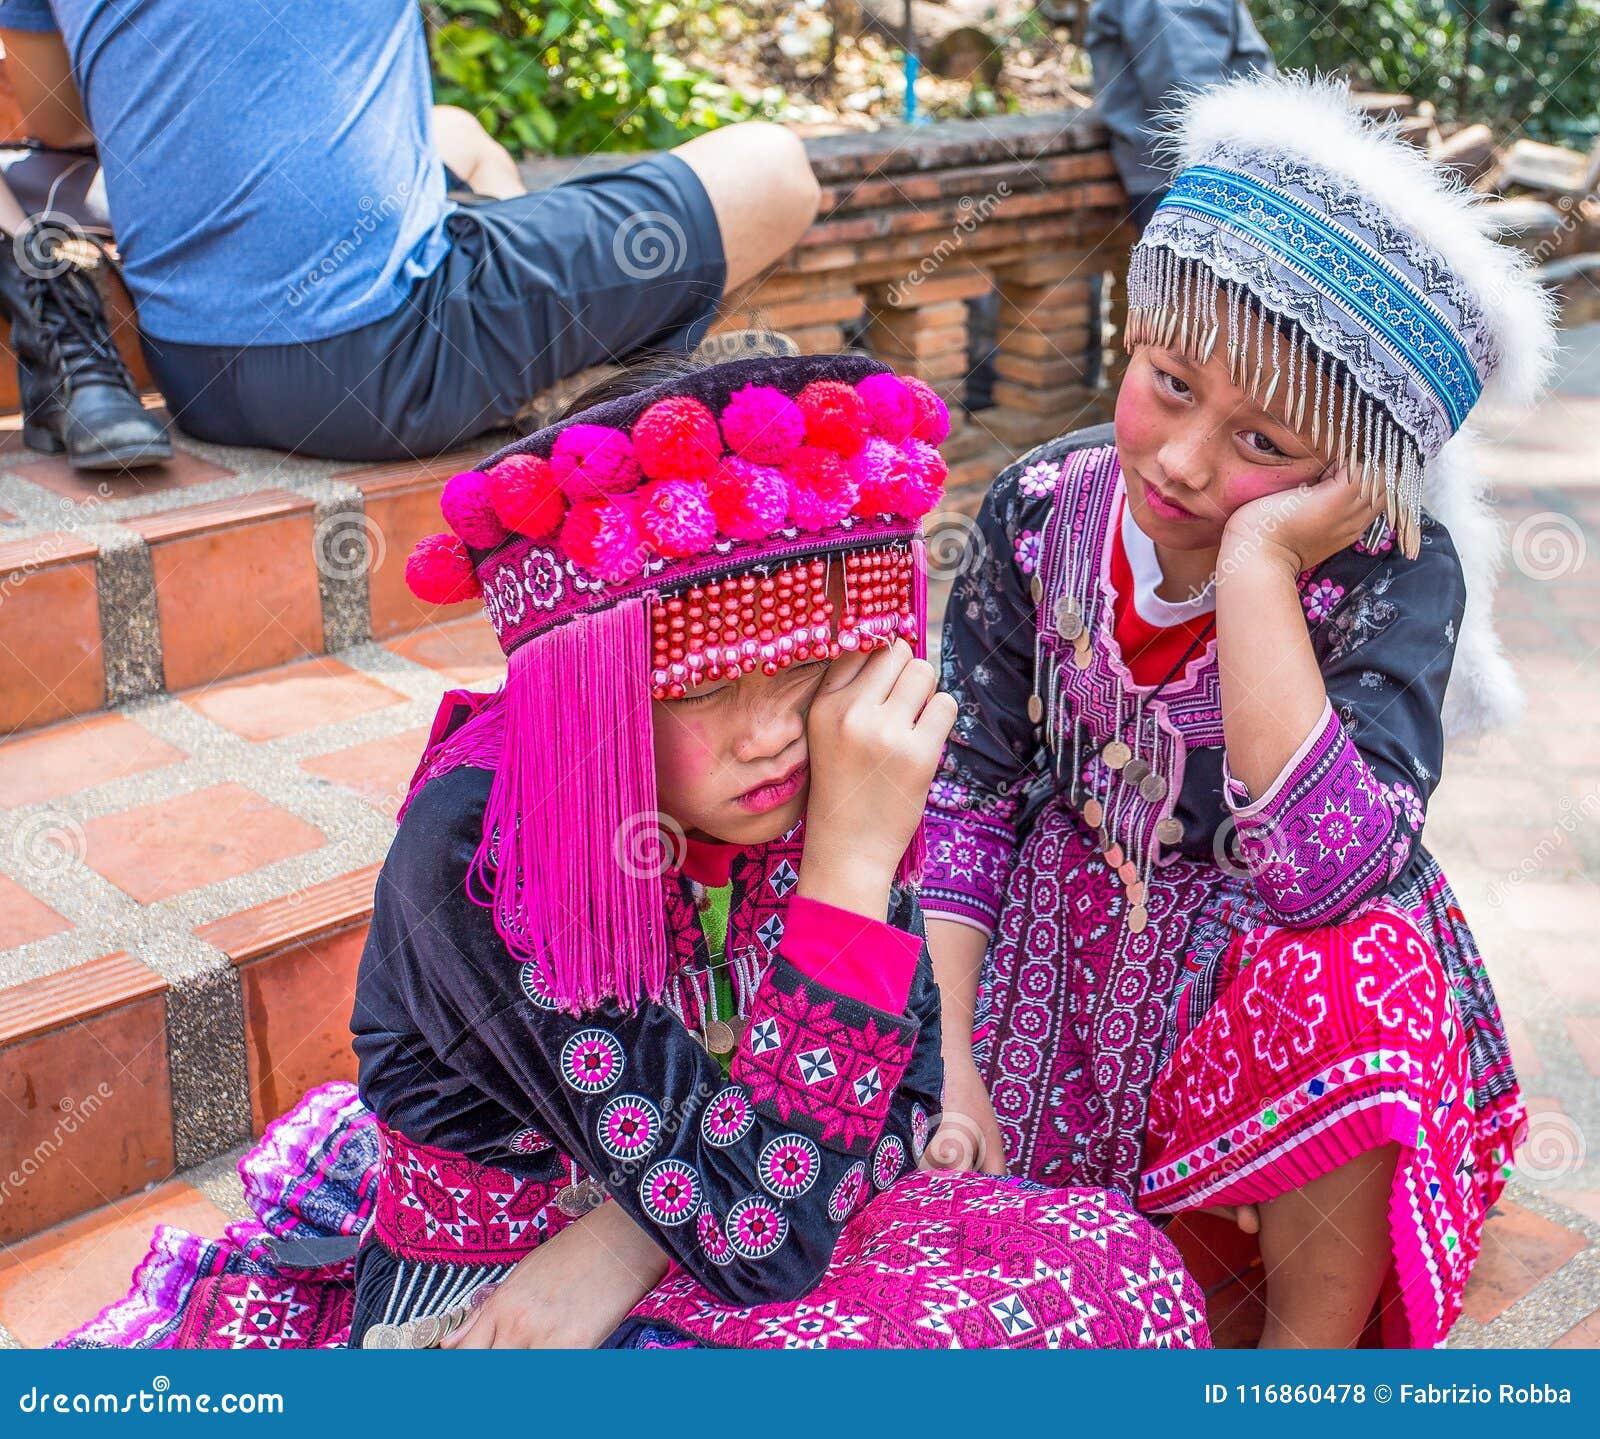 Two unidentified Akha children pose for tourist photos at Wat Phratat Doi Suthep on in Chiang Mai, Thailand.